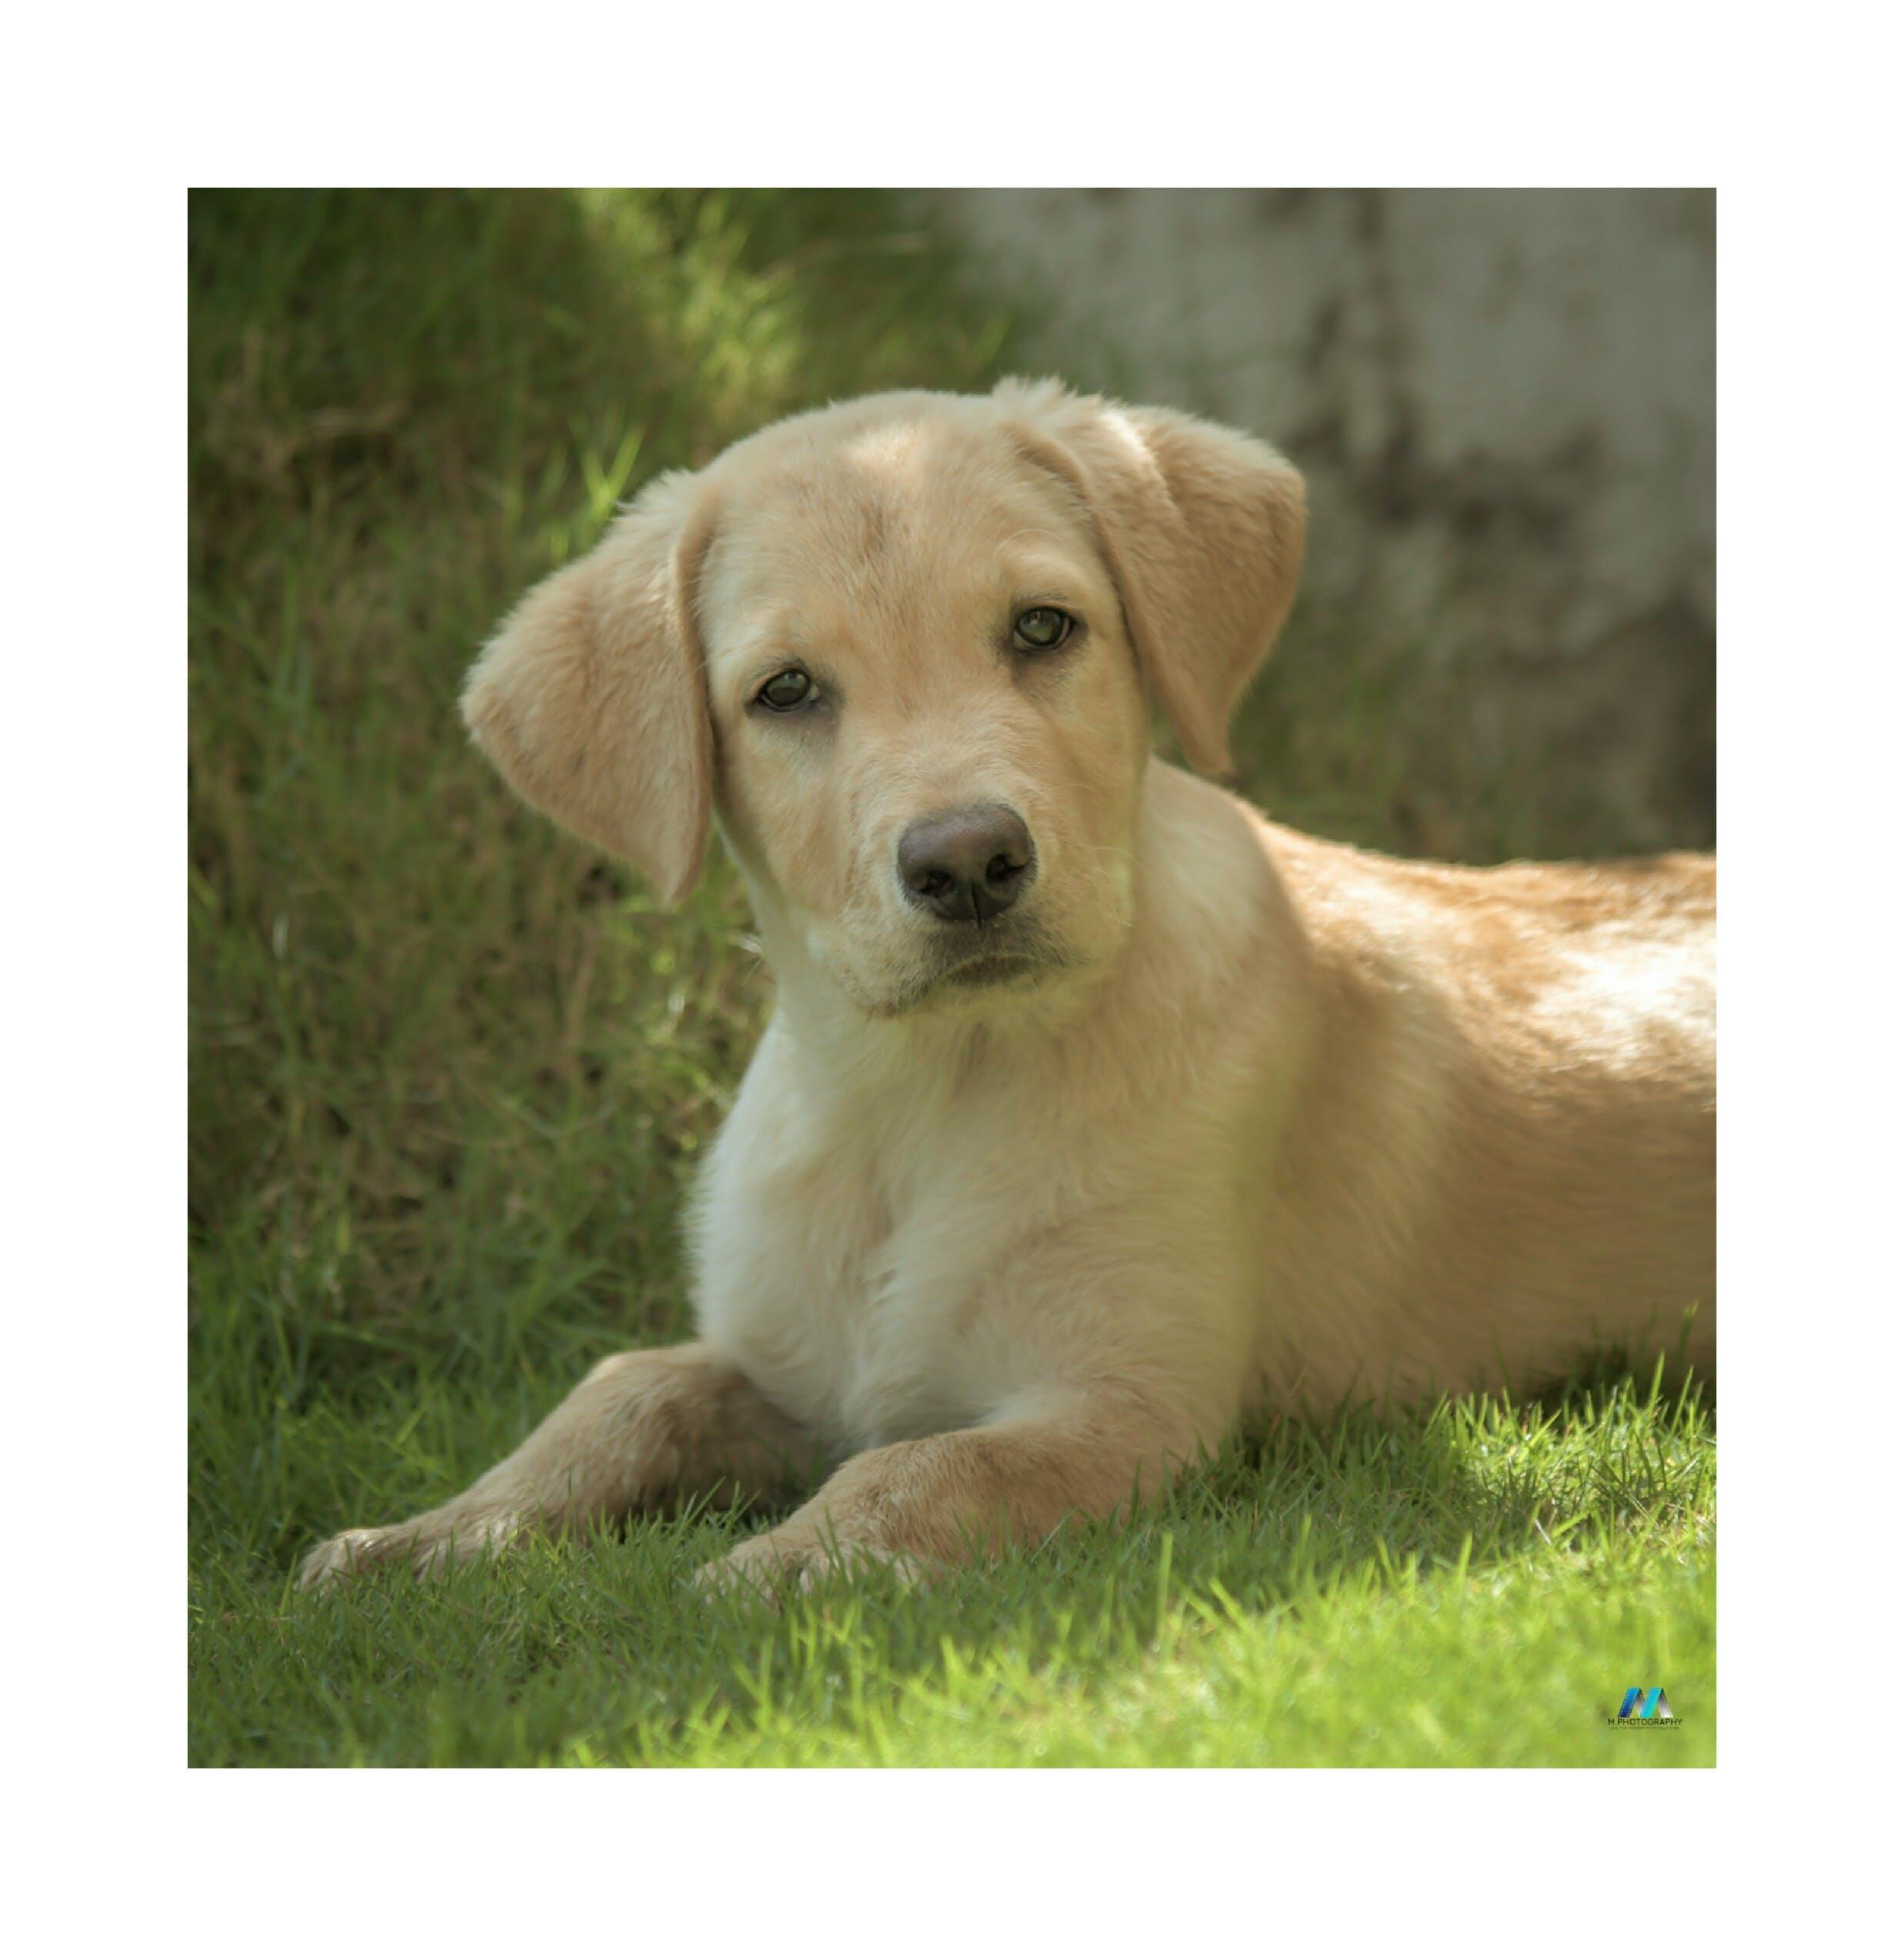 Free stock photo of baby dog, cute, cute animals, dark green